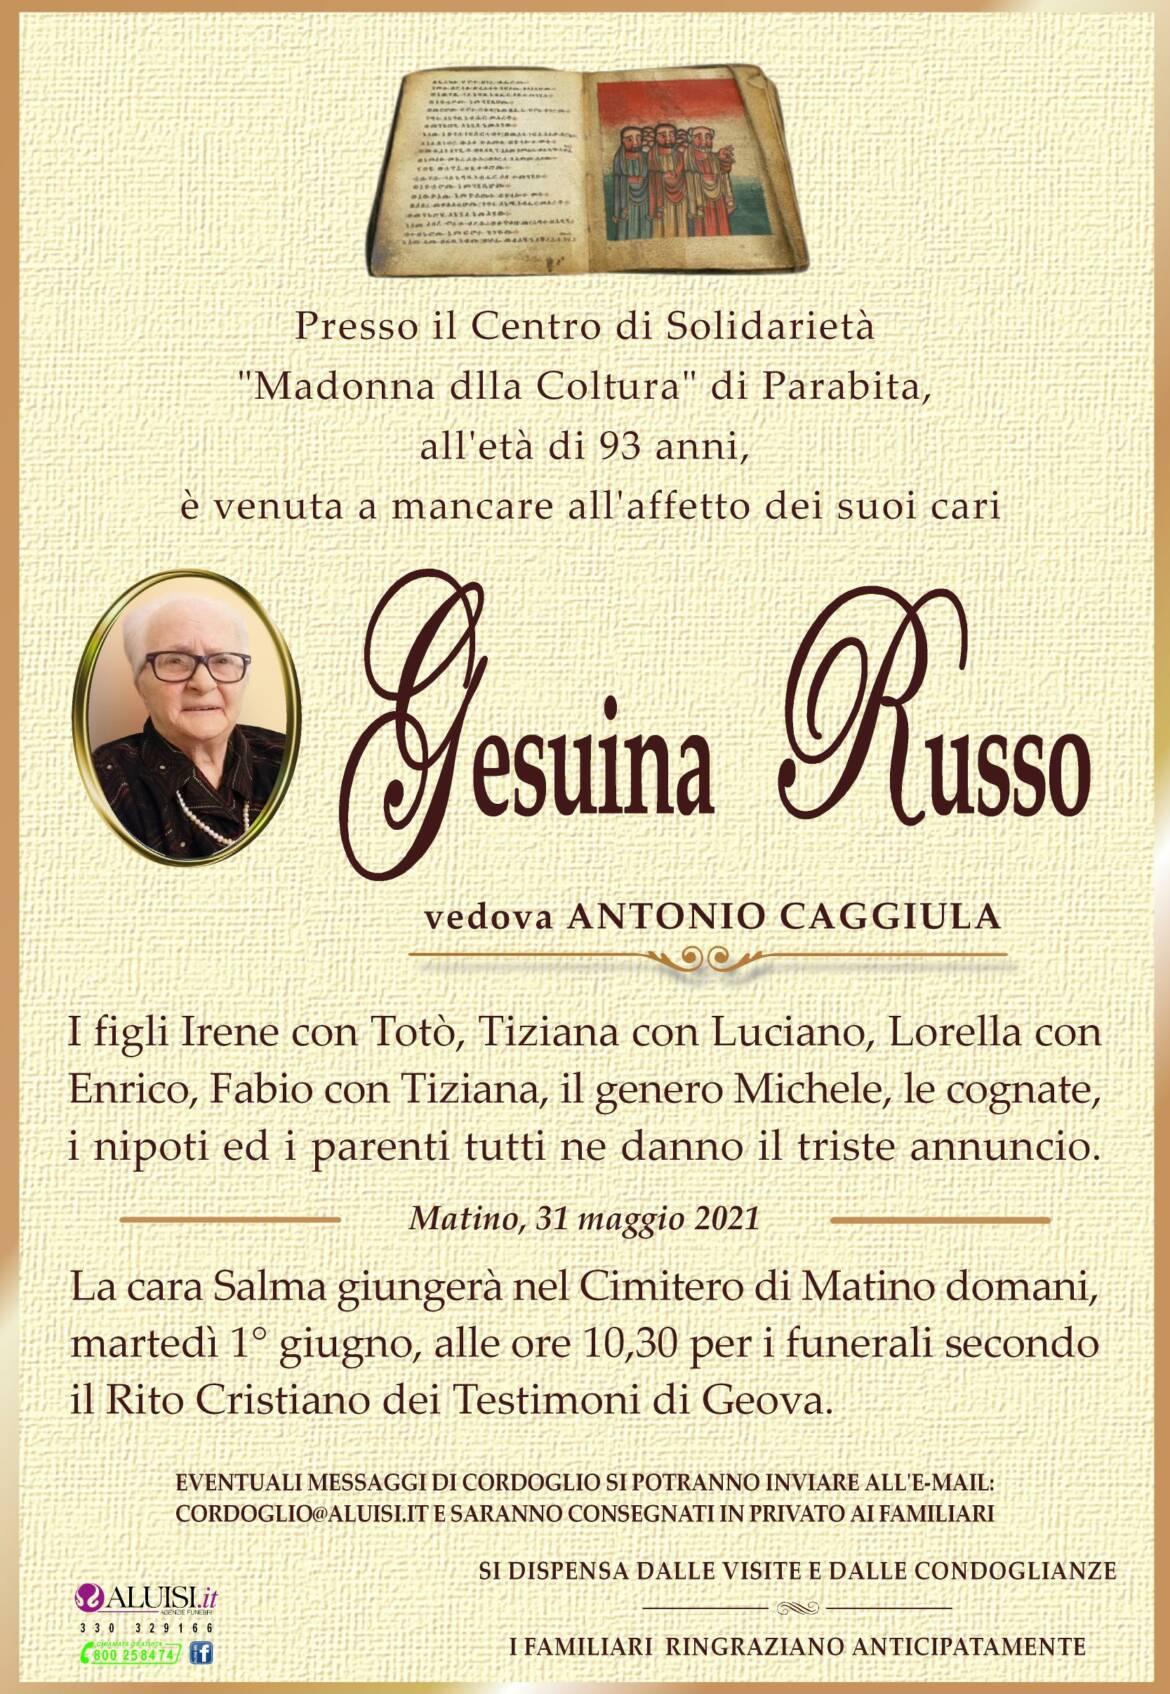 Annuncio-GESUINA-RUSSO-MATINO.jpg